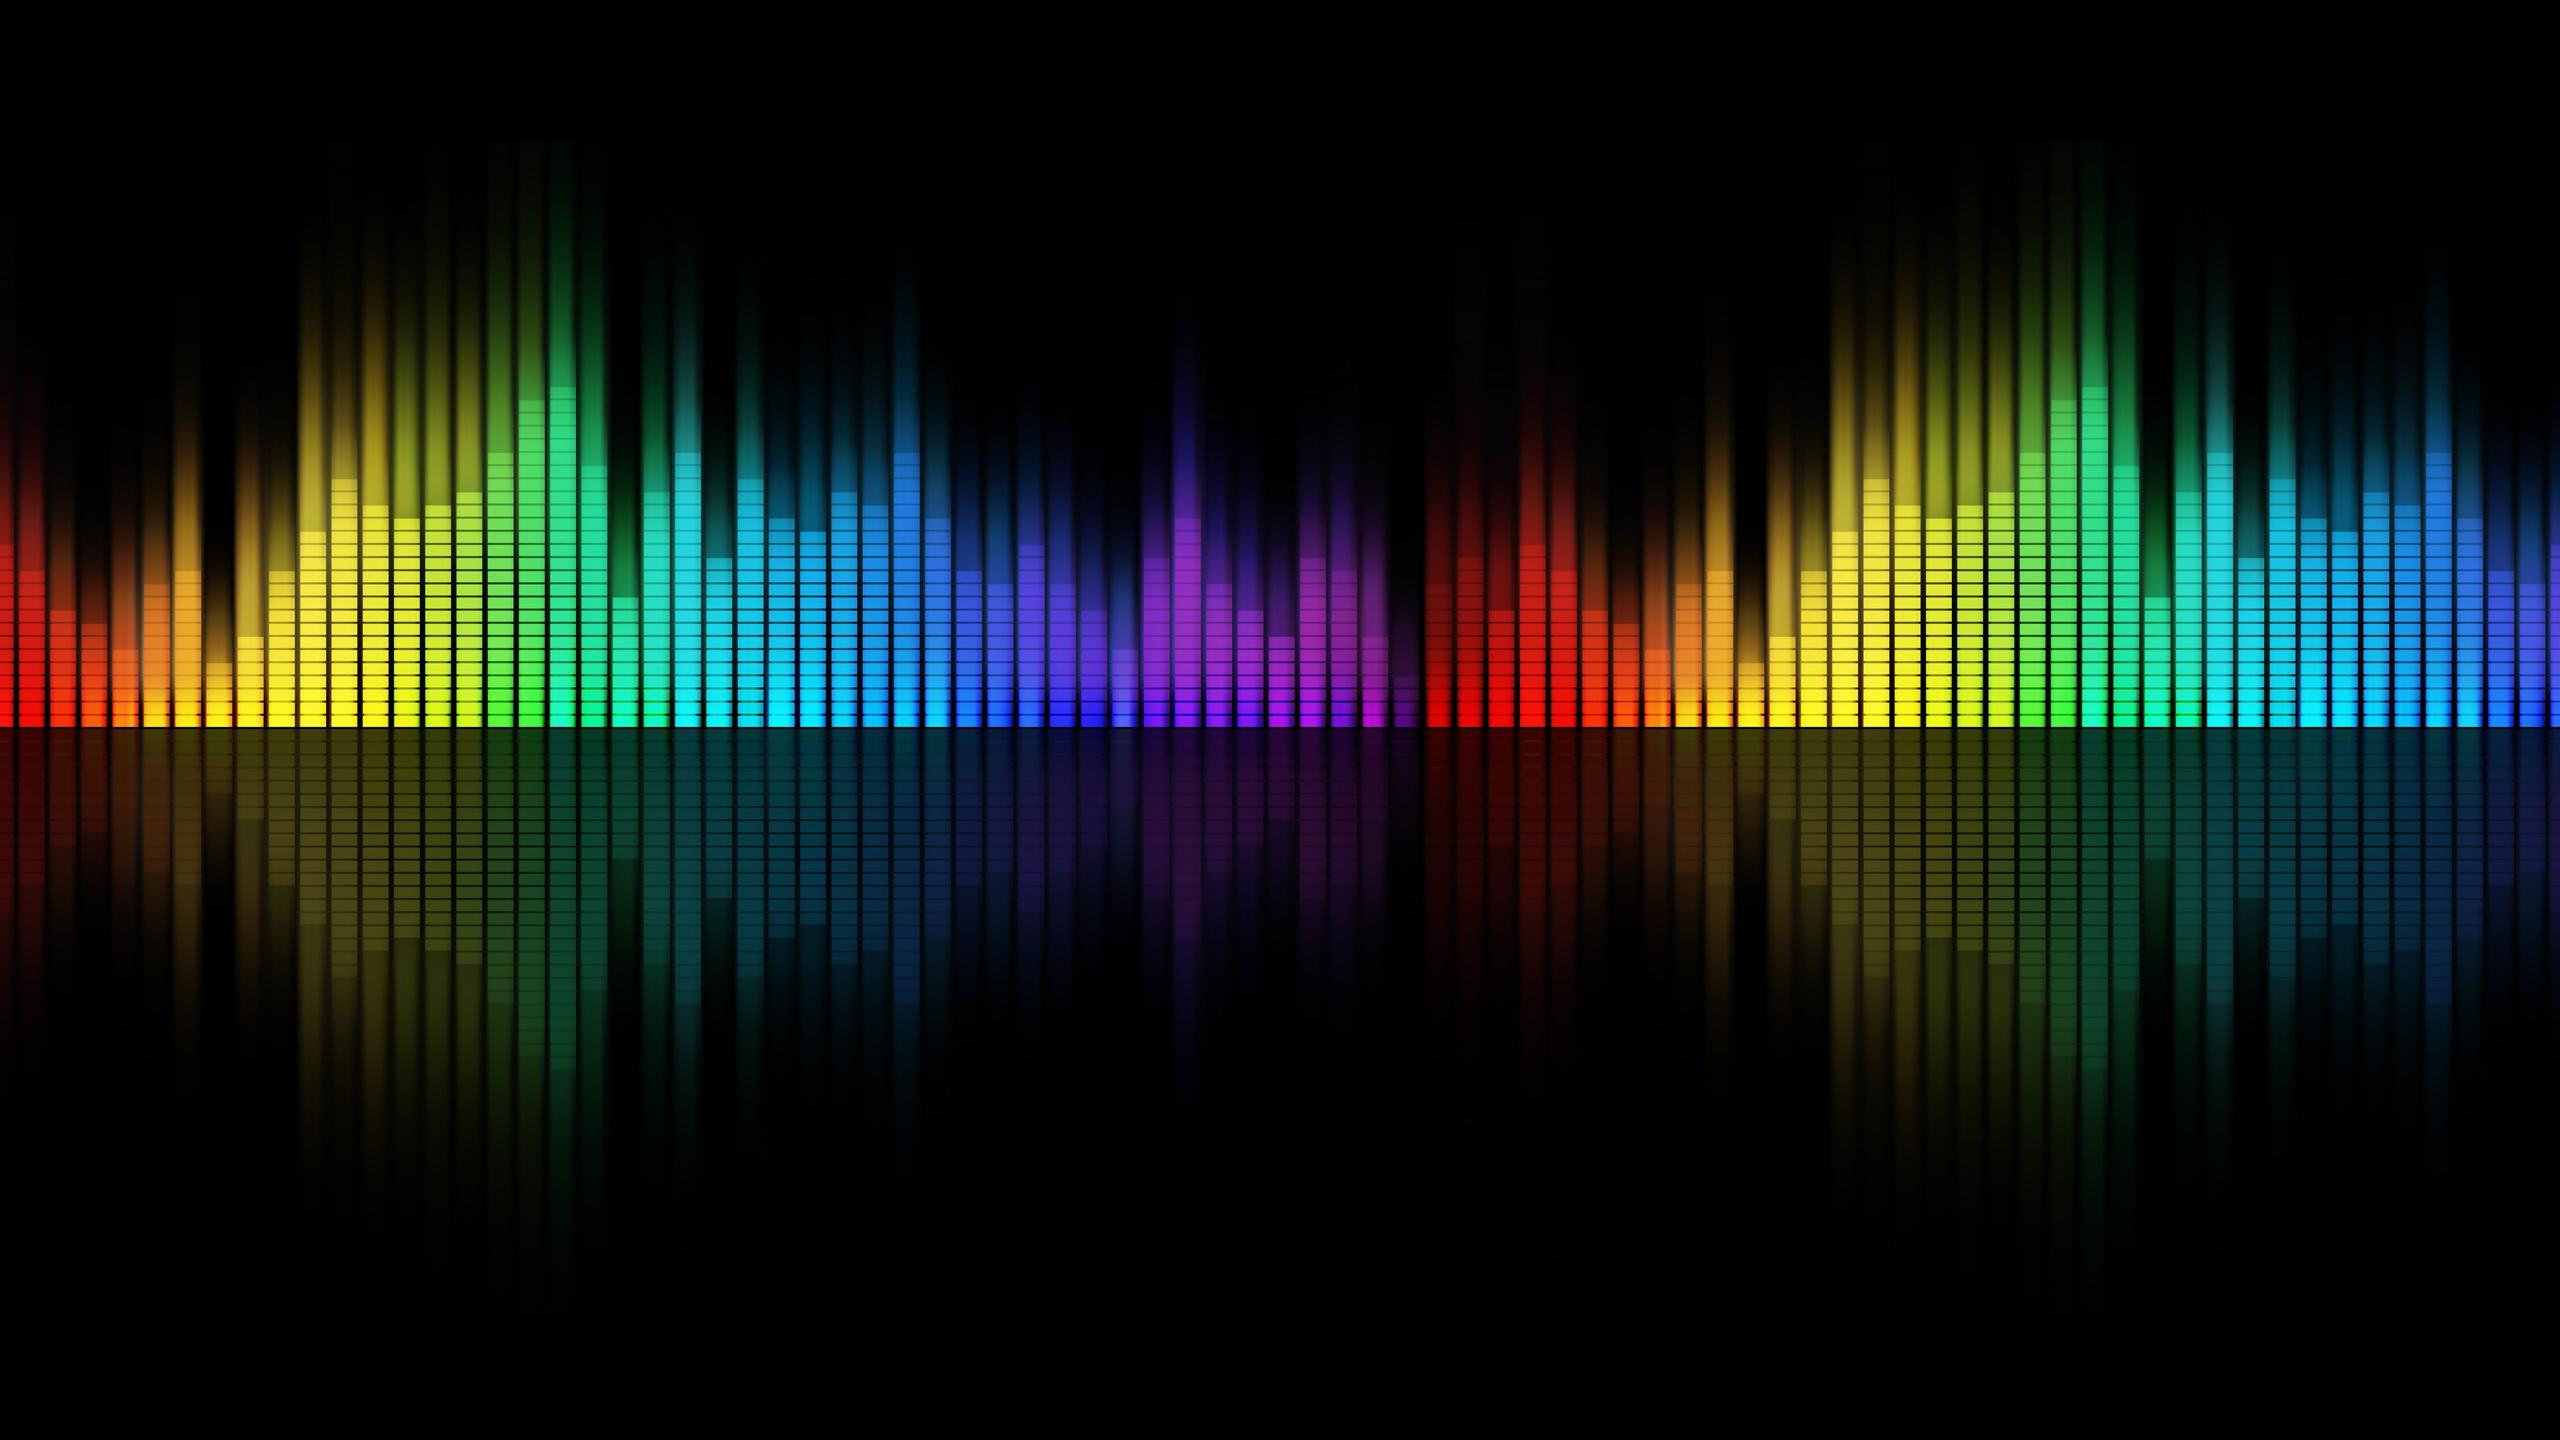 Razor 3d Wallpaper Steam Workshop Audio Visualizers